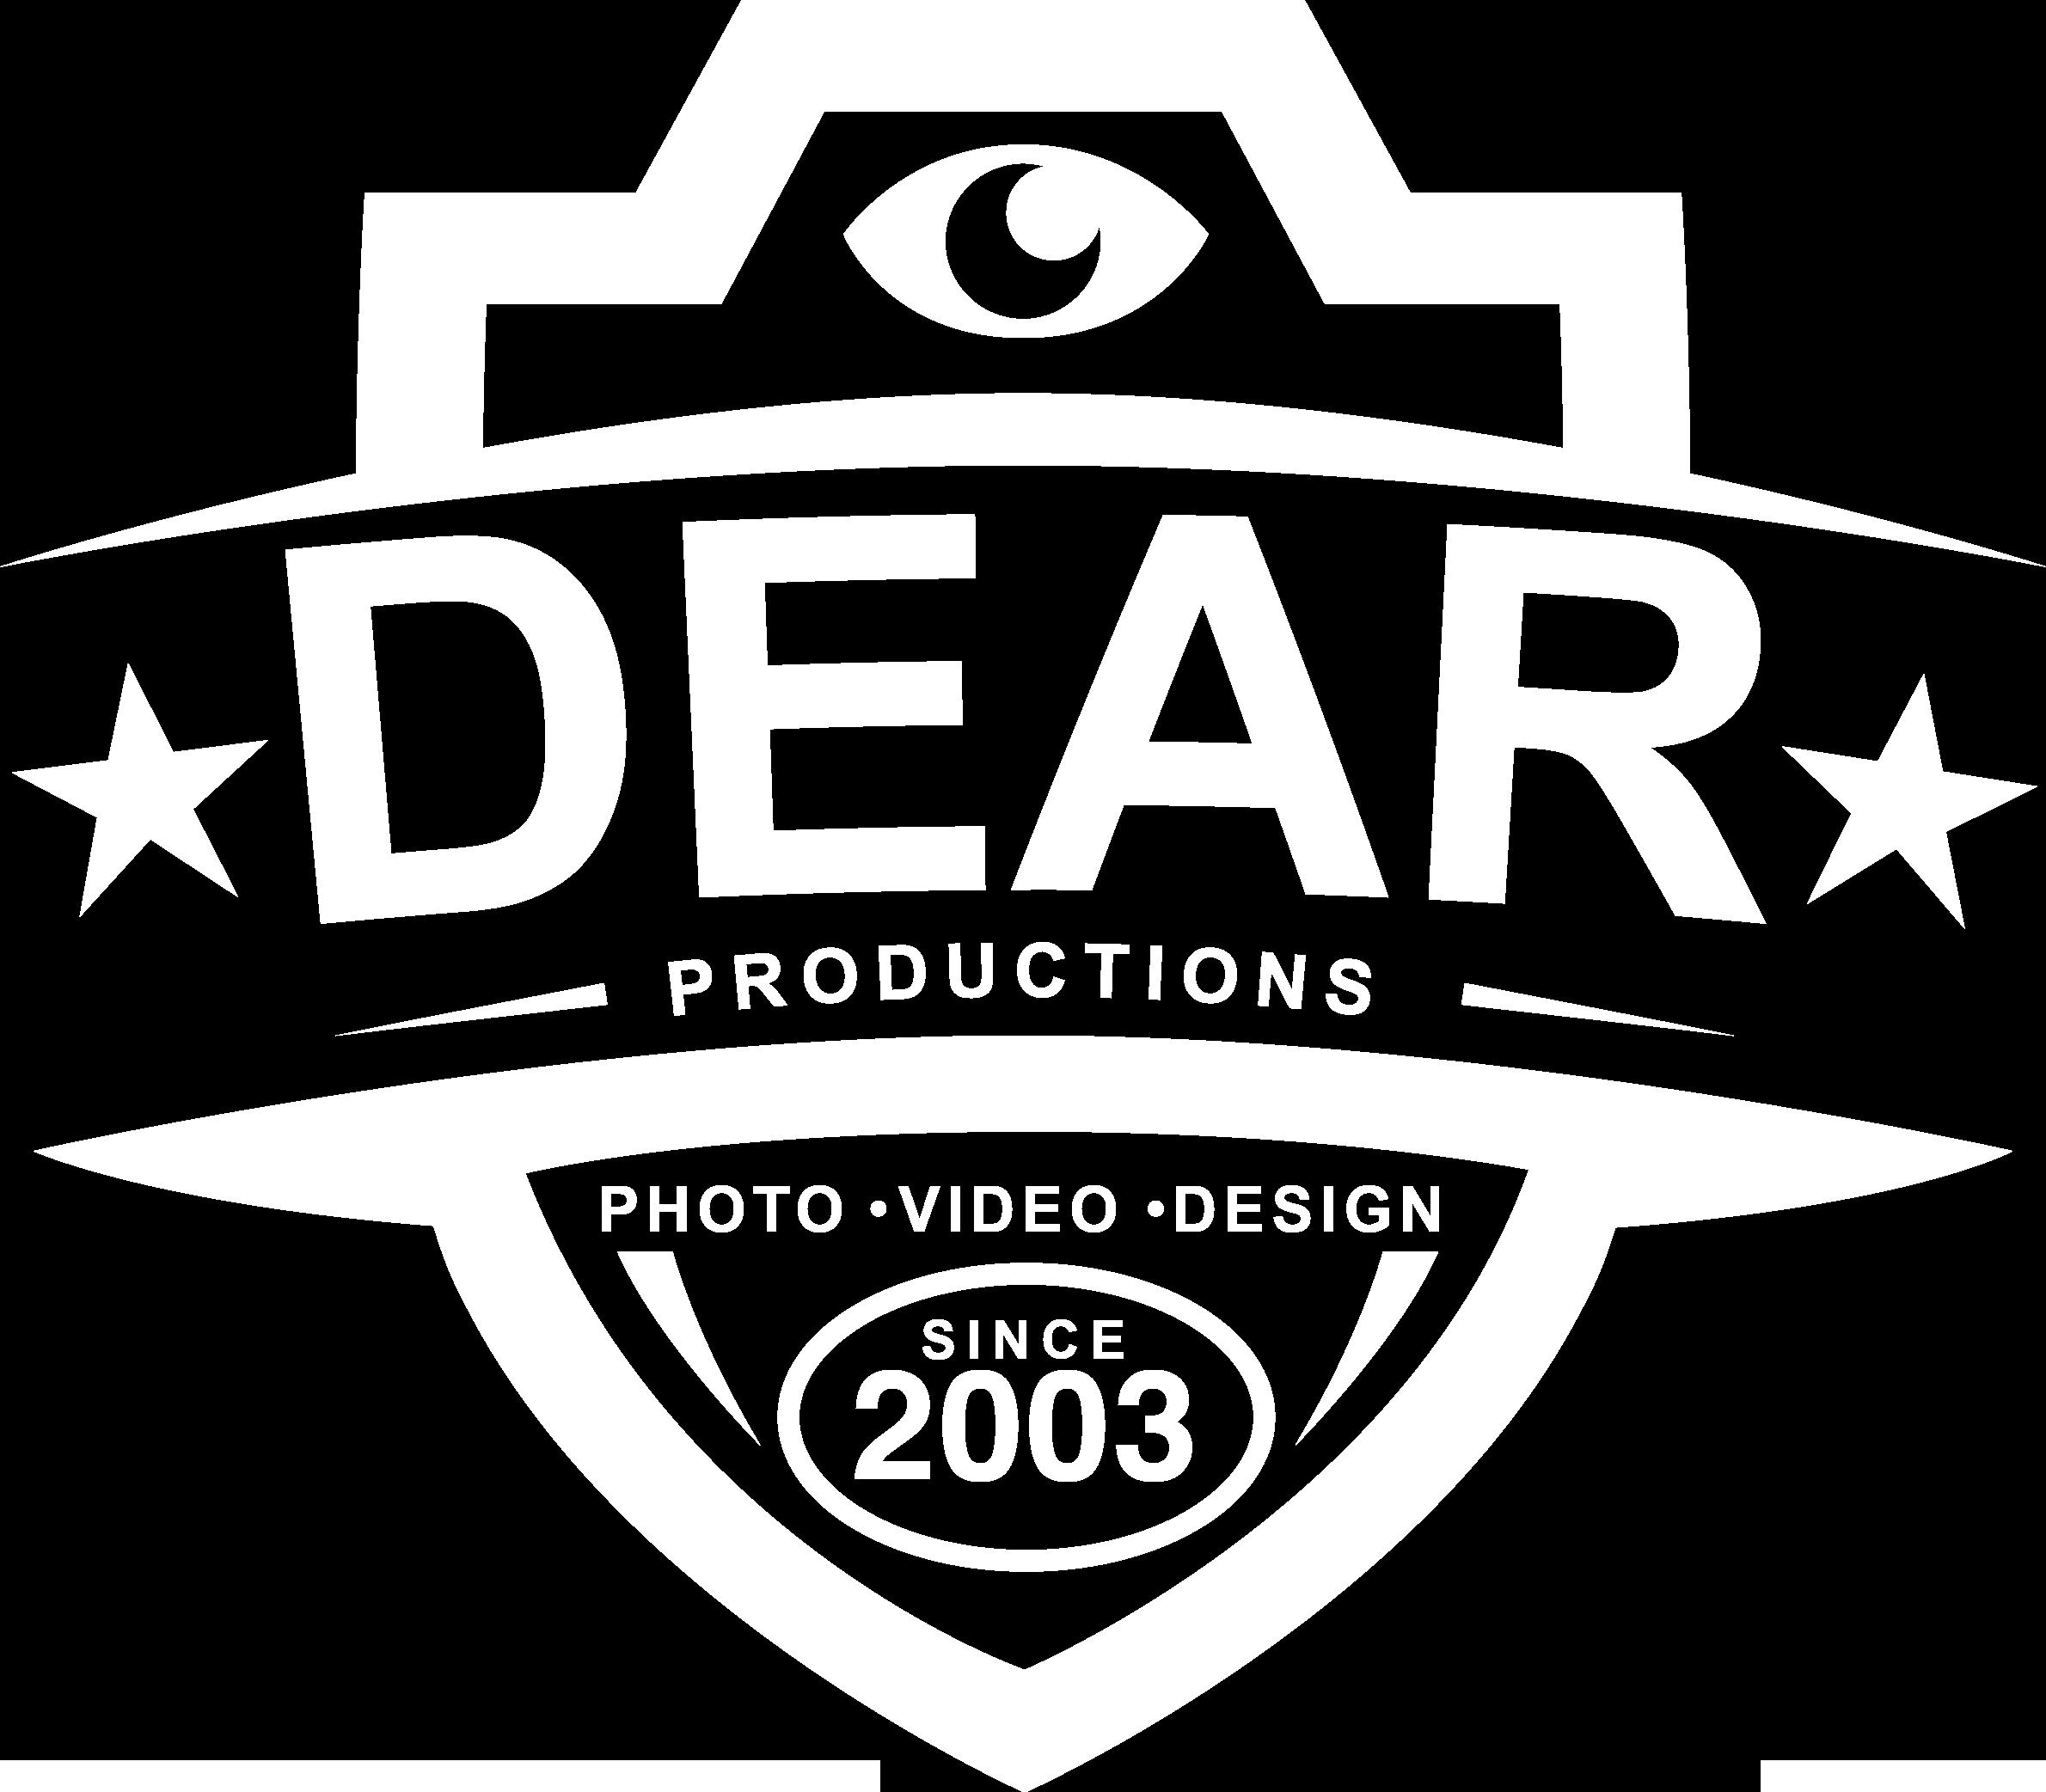 Dear Productions